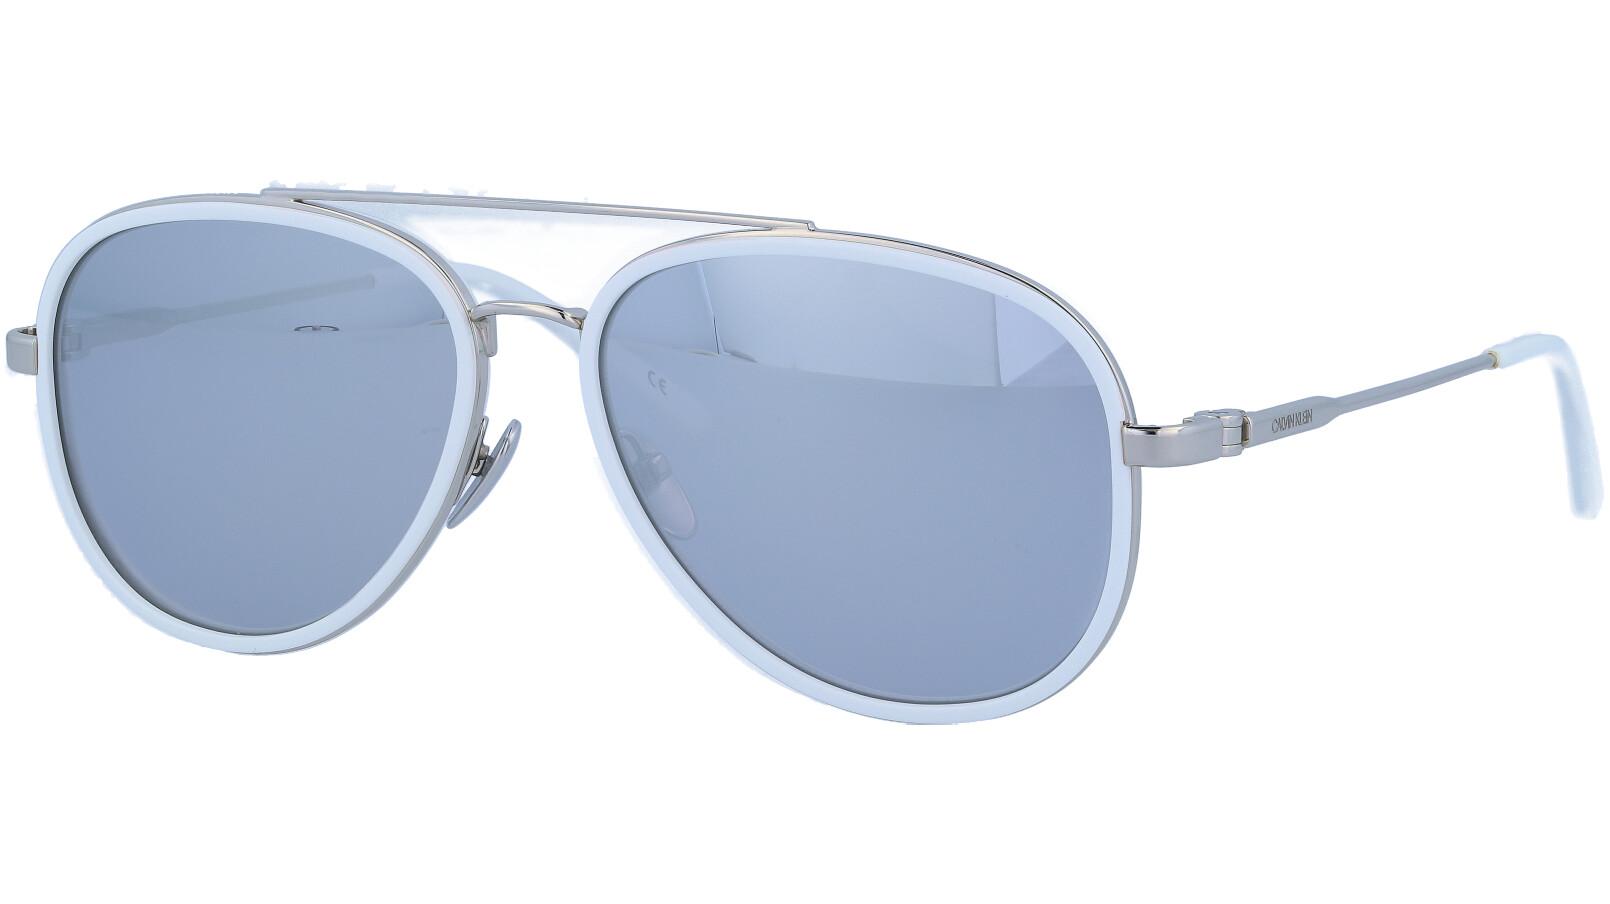 CALVIN KLEIN CK18103S 100 57 WHITE Sunglasses